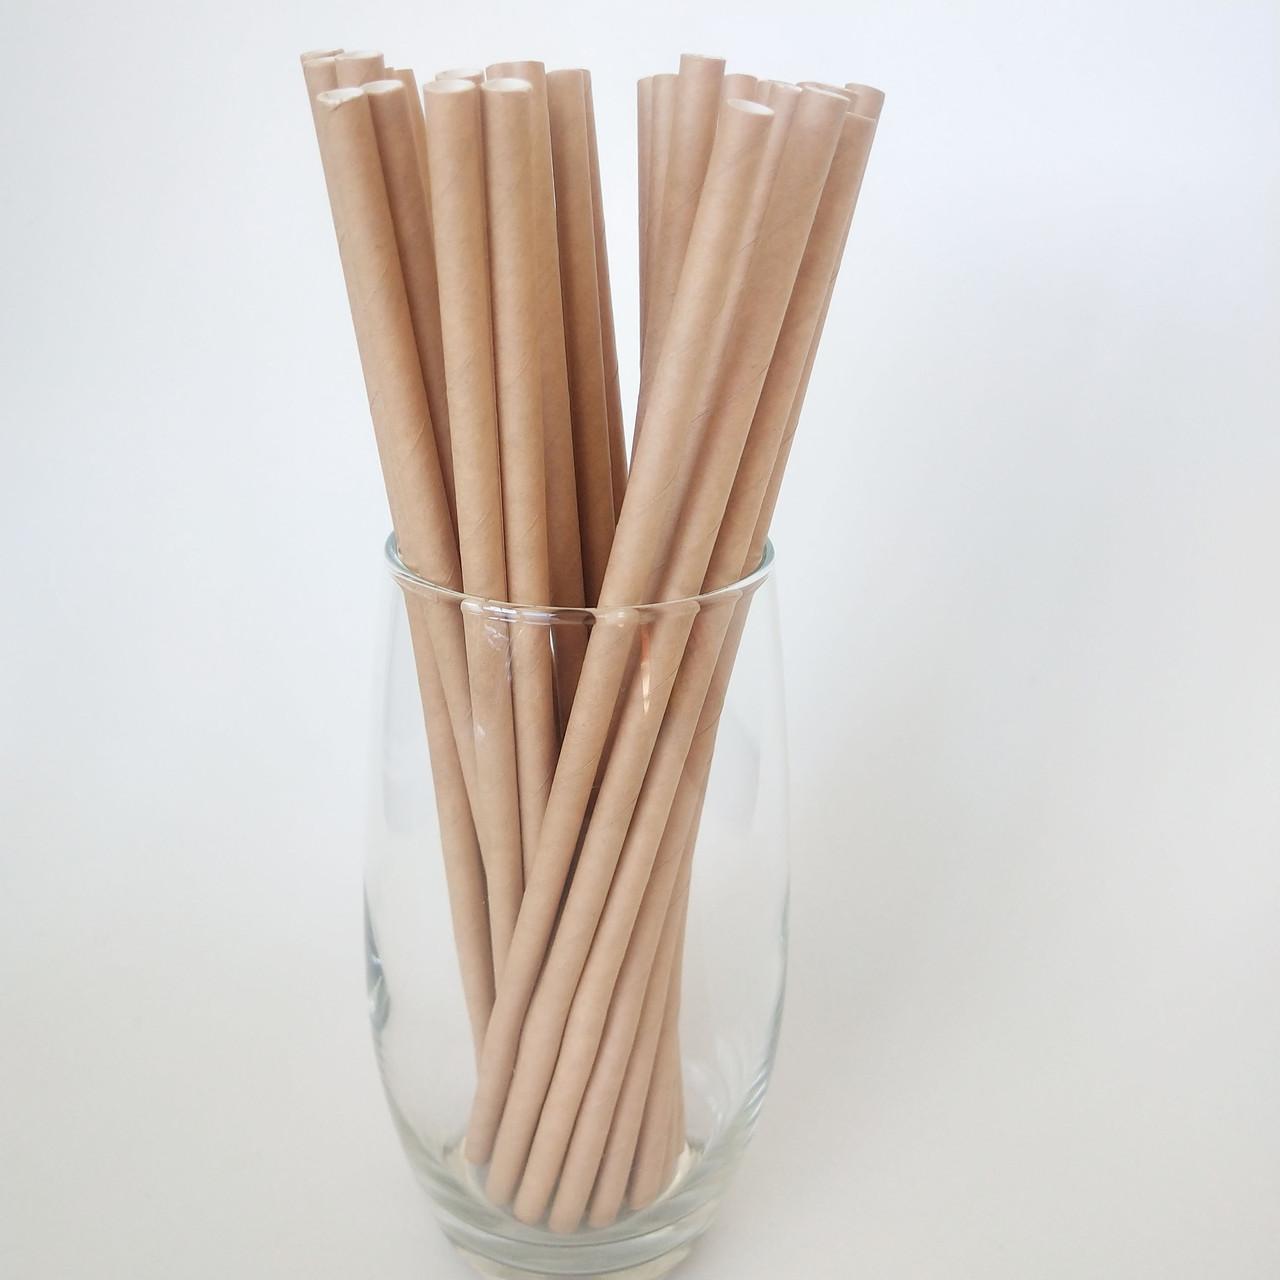 Трубочки для соку паперові 25 шт 1744